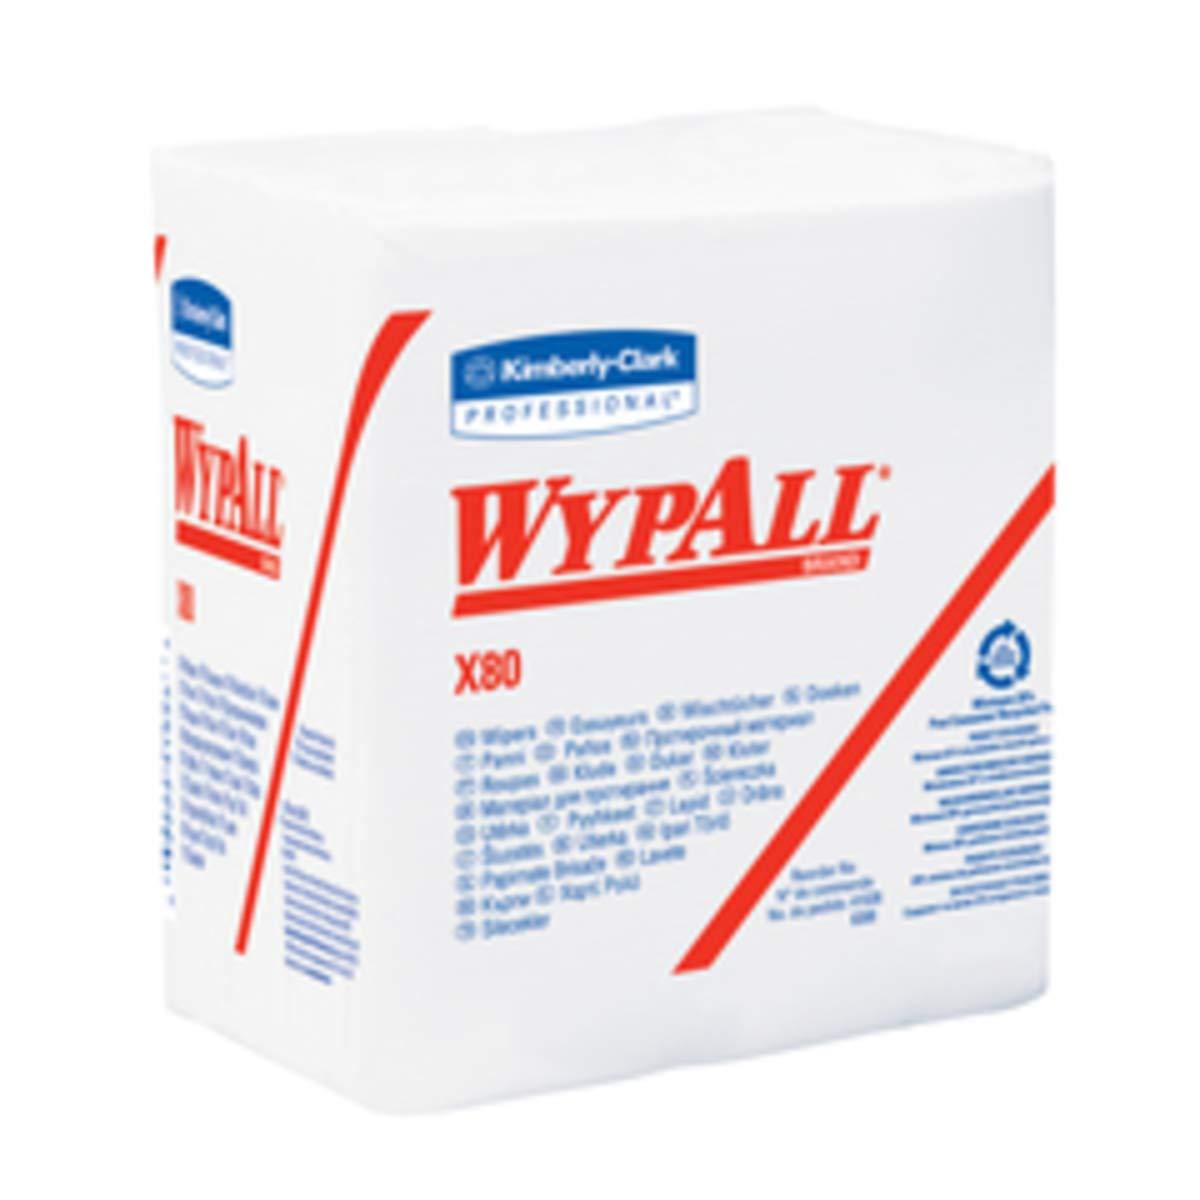 Kimberly-Clark Professional WYPALL X80 12.5'' X 12'' Red Heavy Duty 1/4 Fold Wiper (50 Per Box)